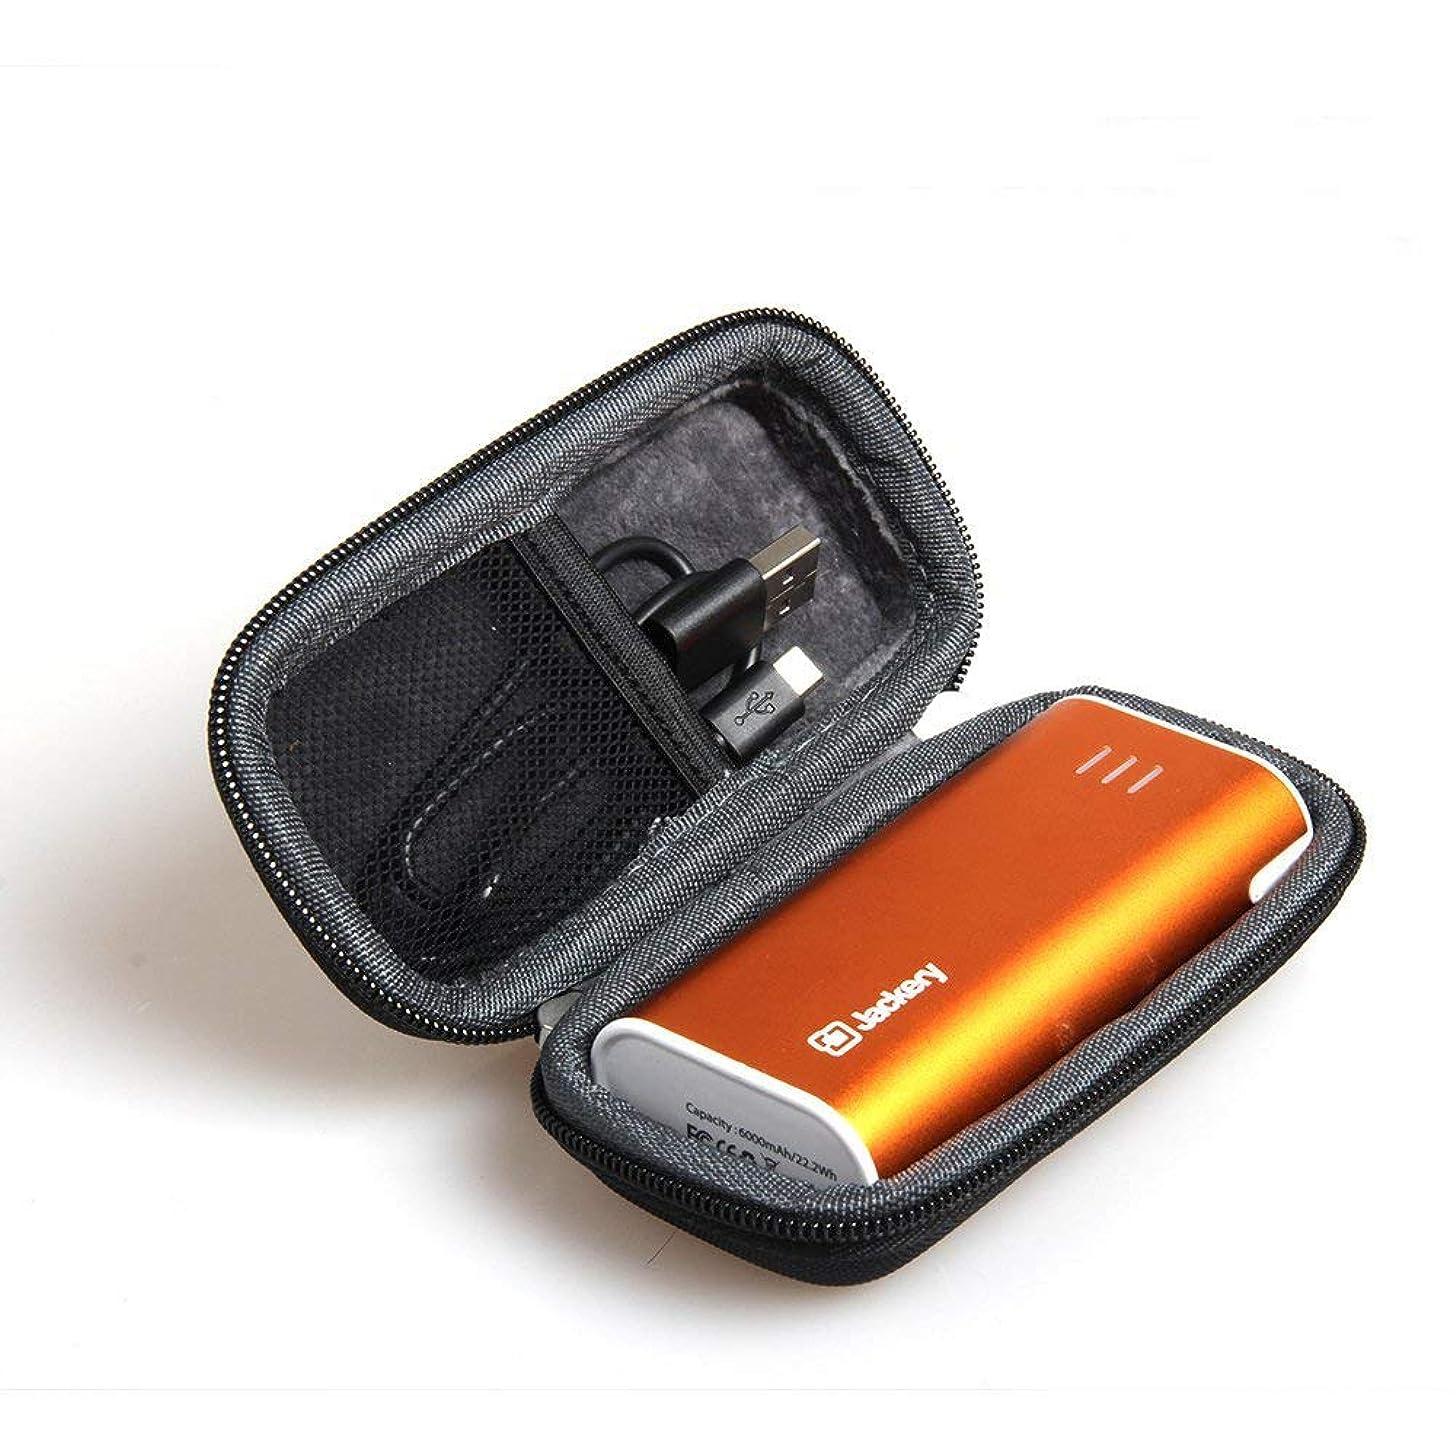 Hermitshell Hard EVA Travel Black Case Fits Jackery Bar Premium 6000mAh External Battery Charger Power Bank